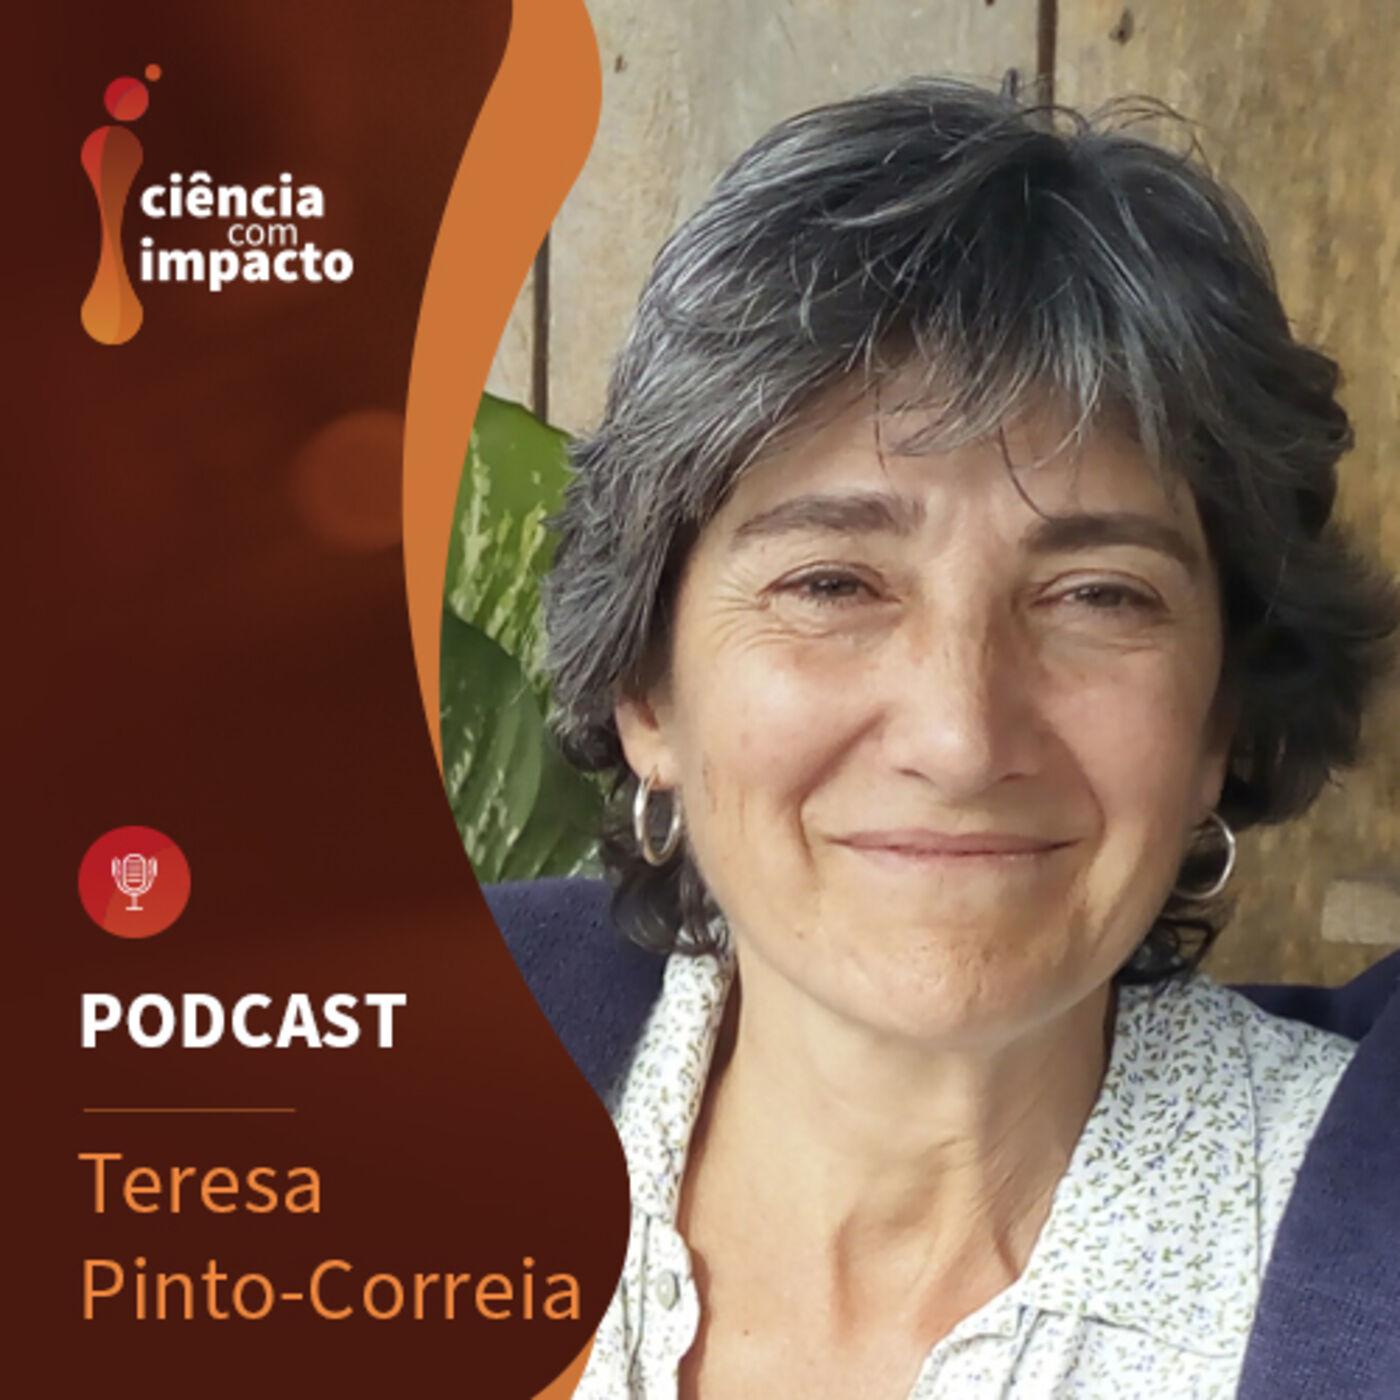 Podcast T2E5: Teresa Pinto-Correia - Cuidar dos solos e da Biodiversidade